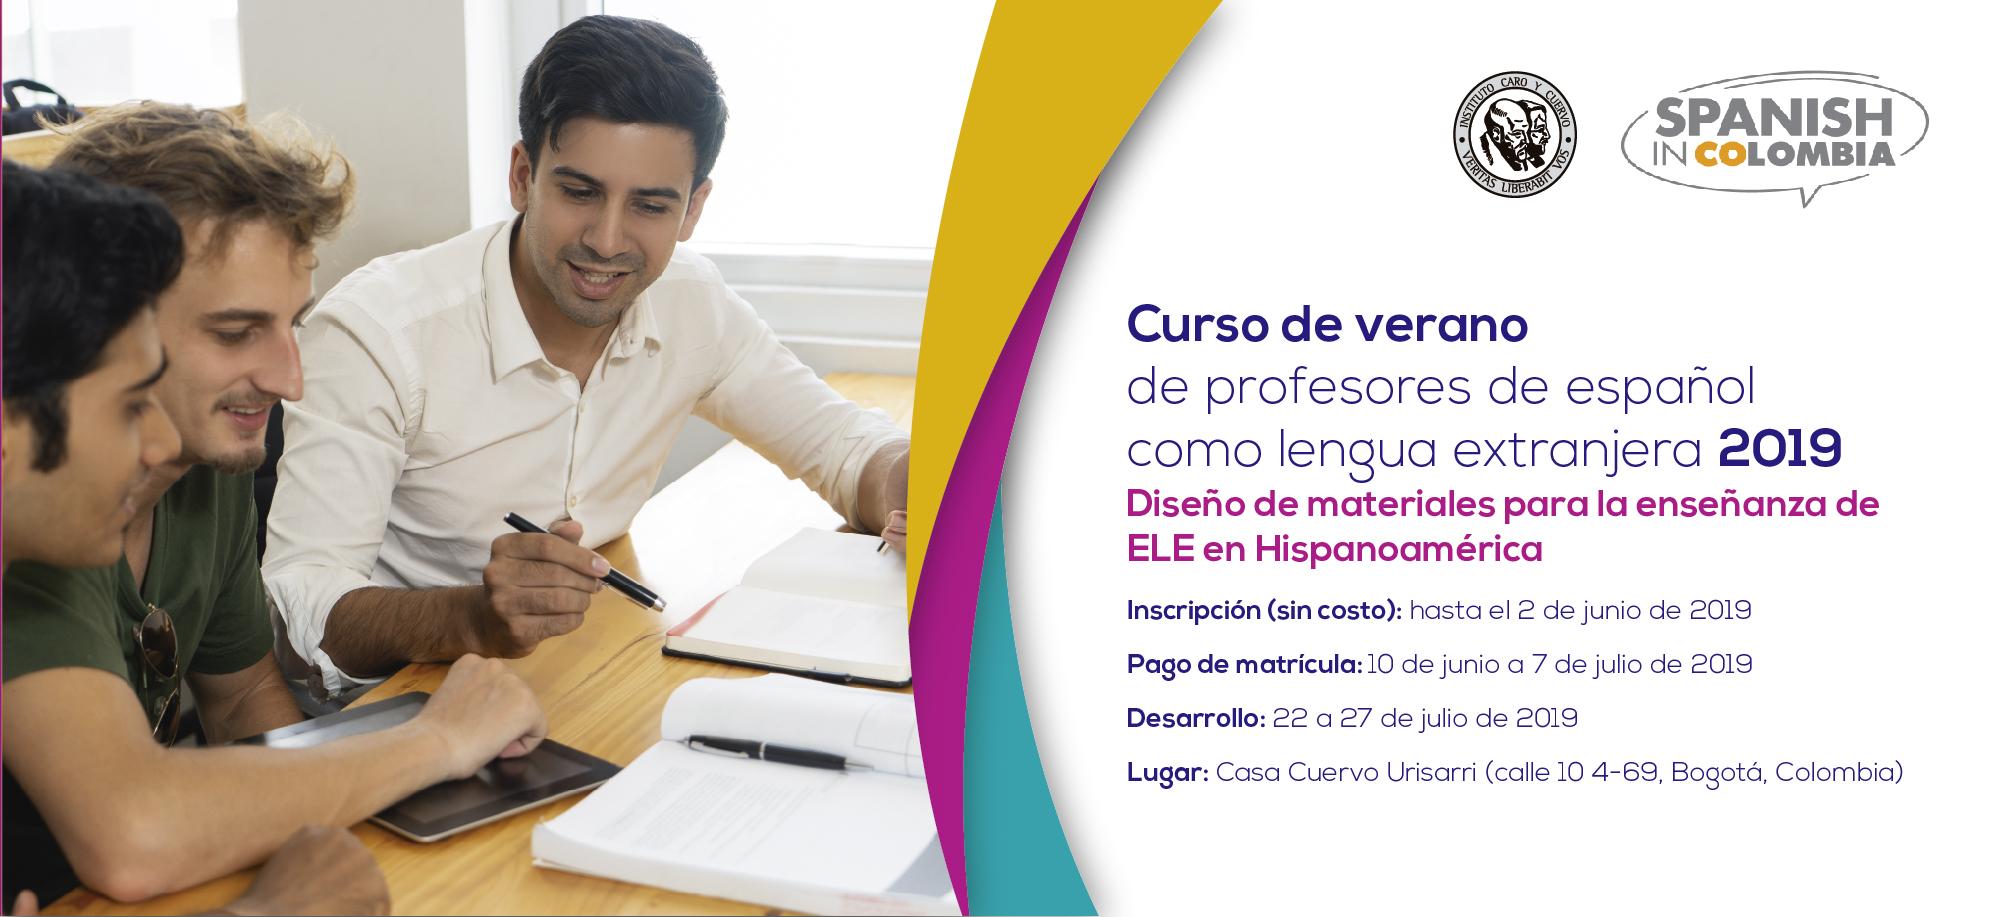 Curso de verano de profesores de español como lengua extranjera 2019